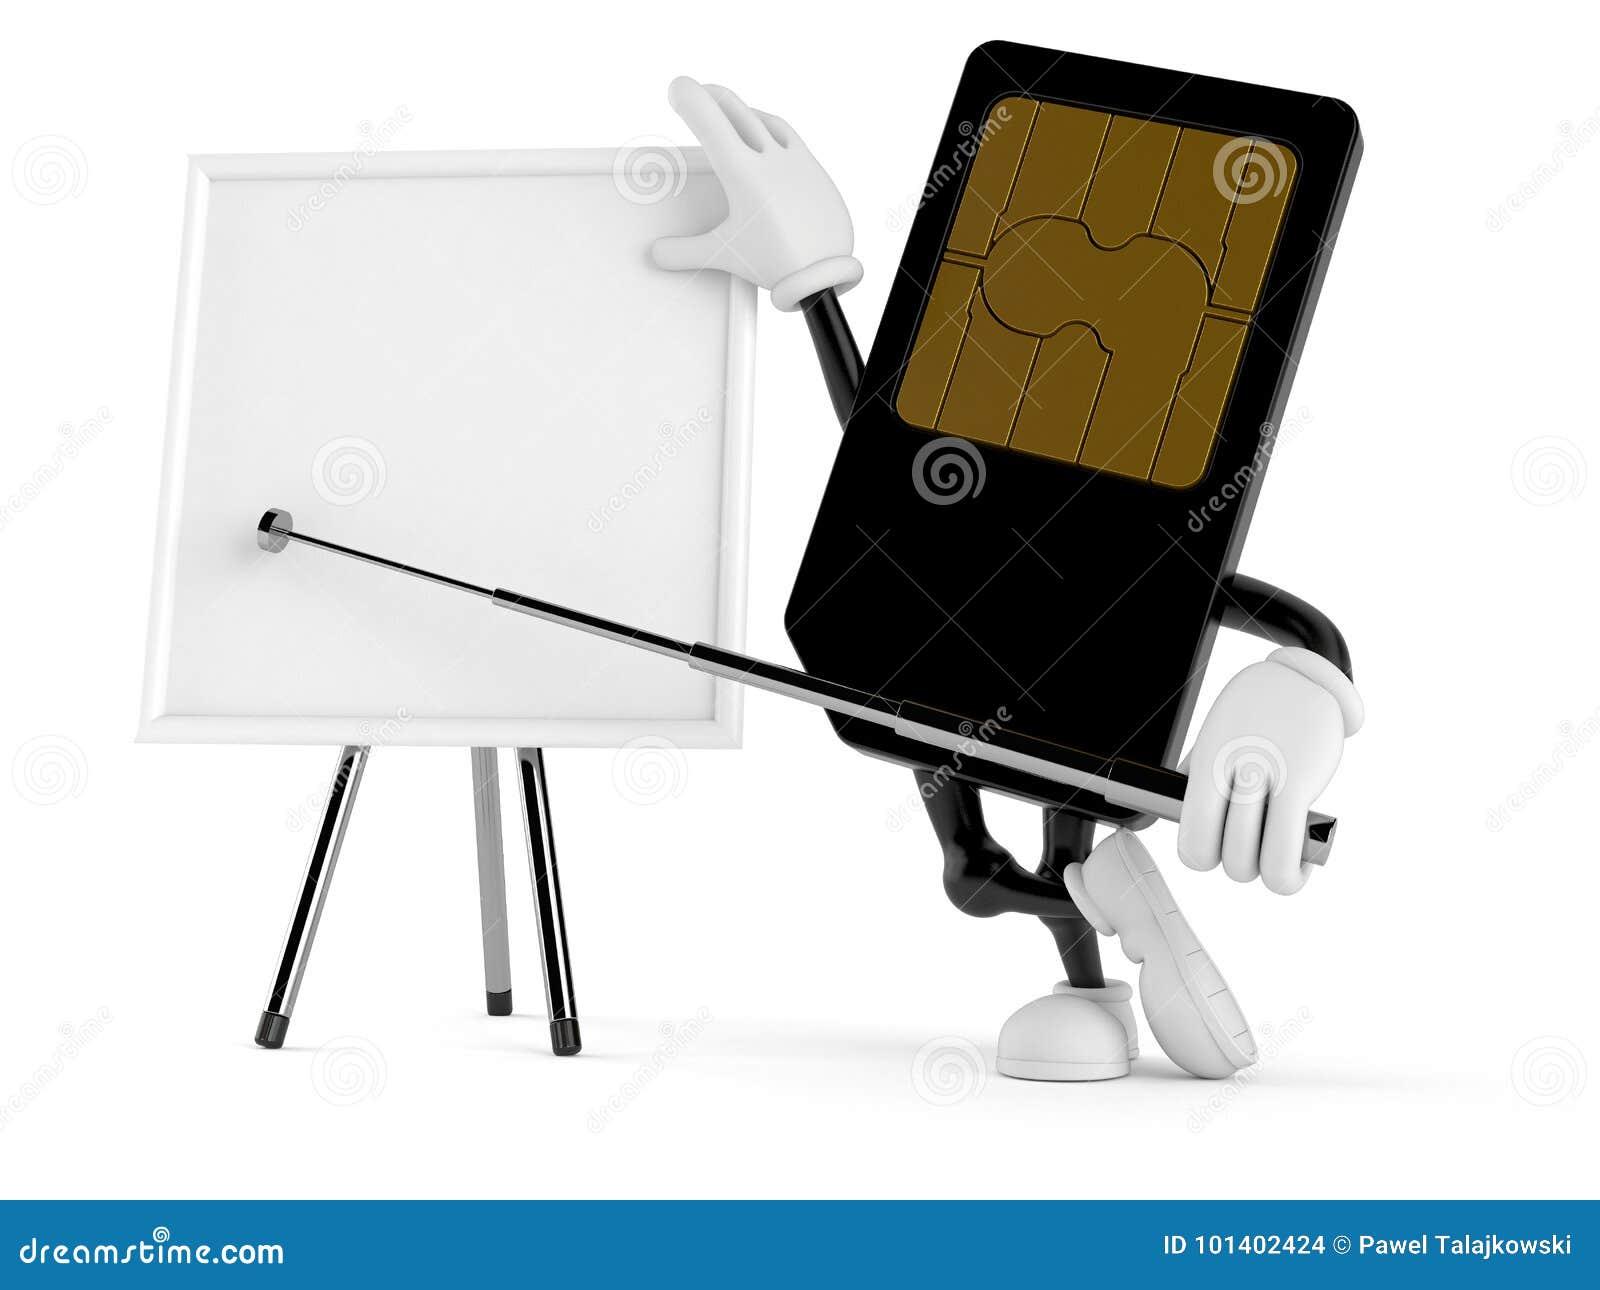 How to block a sim card Megaphone 18